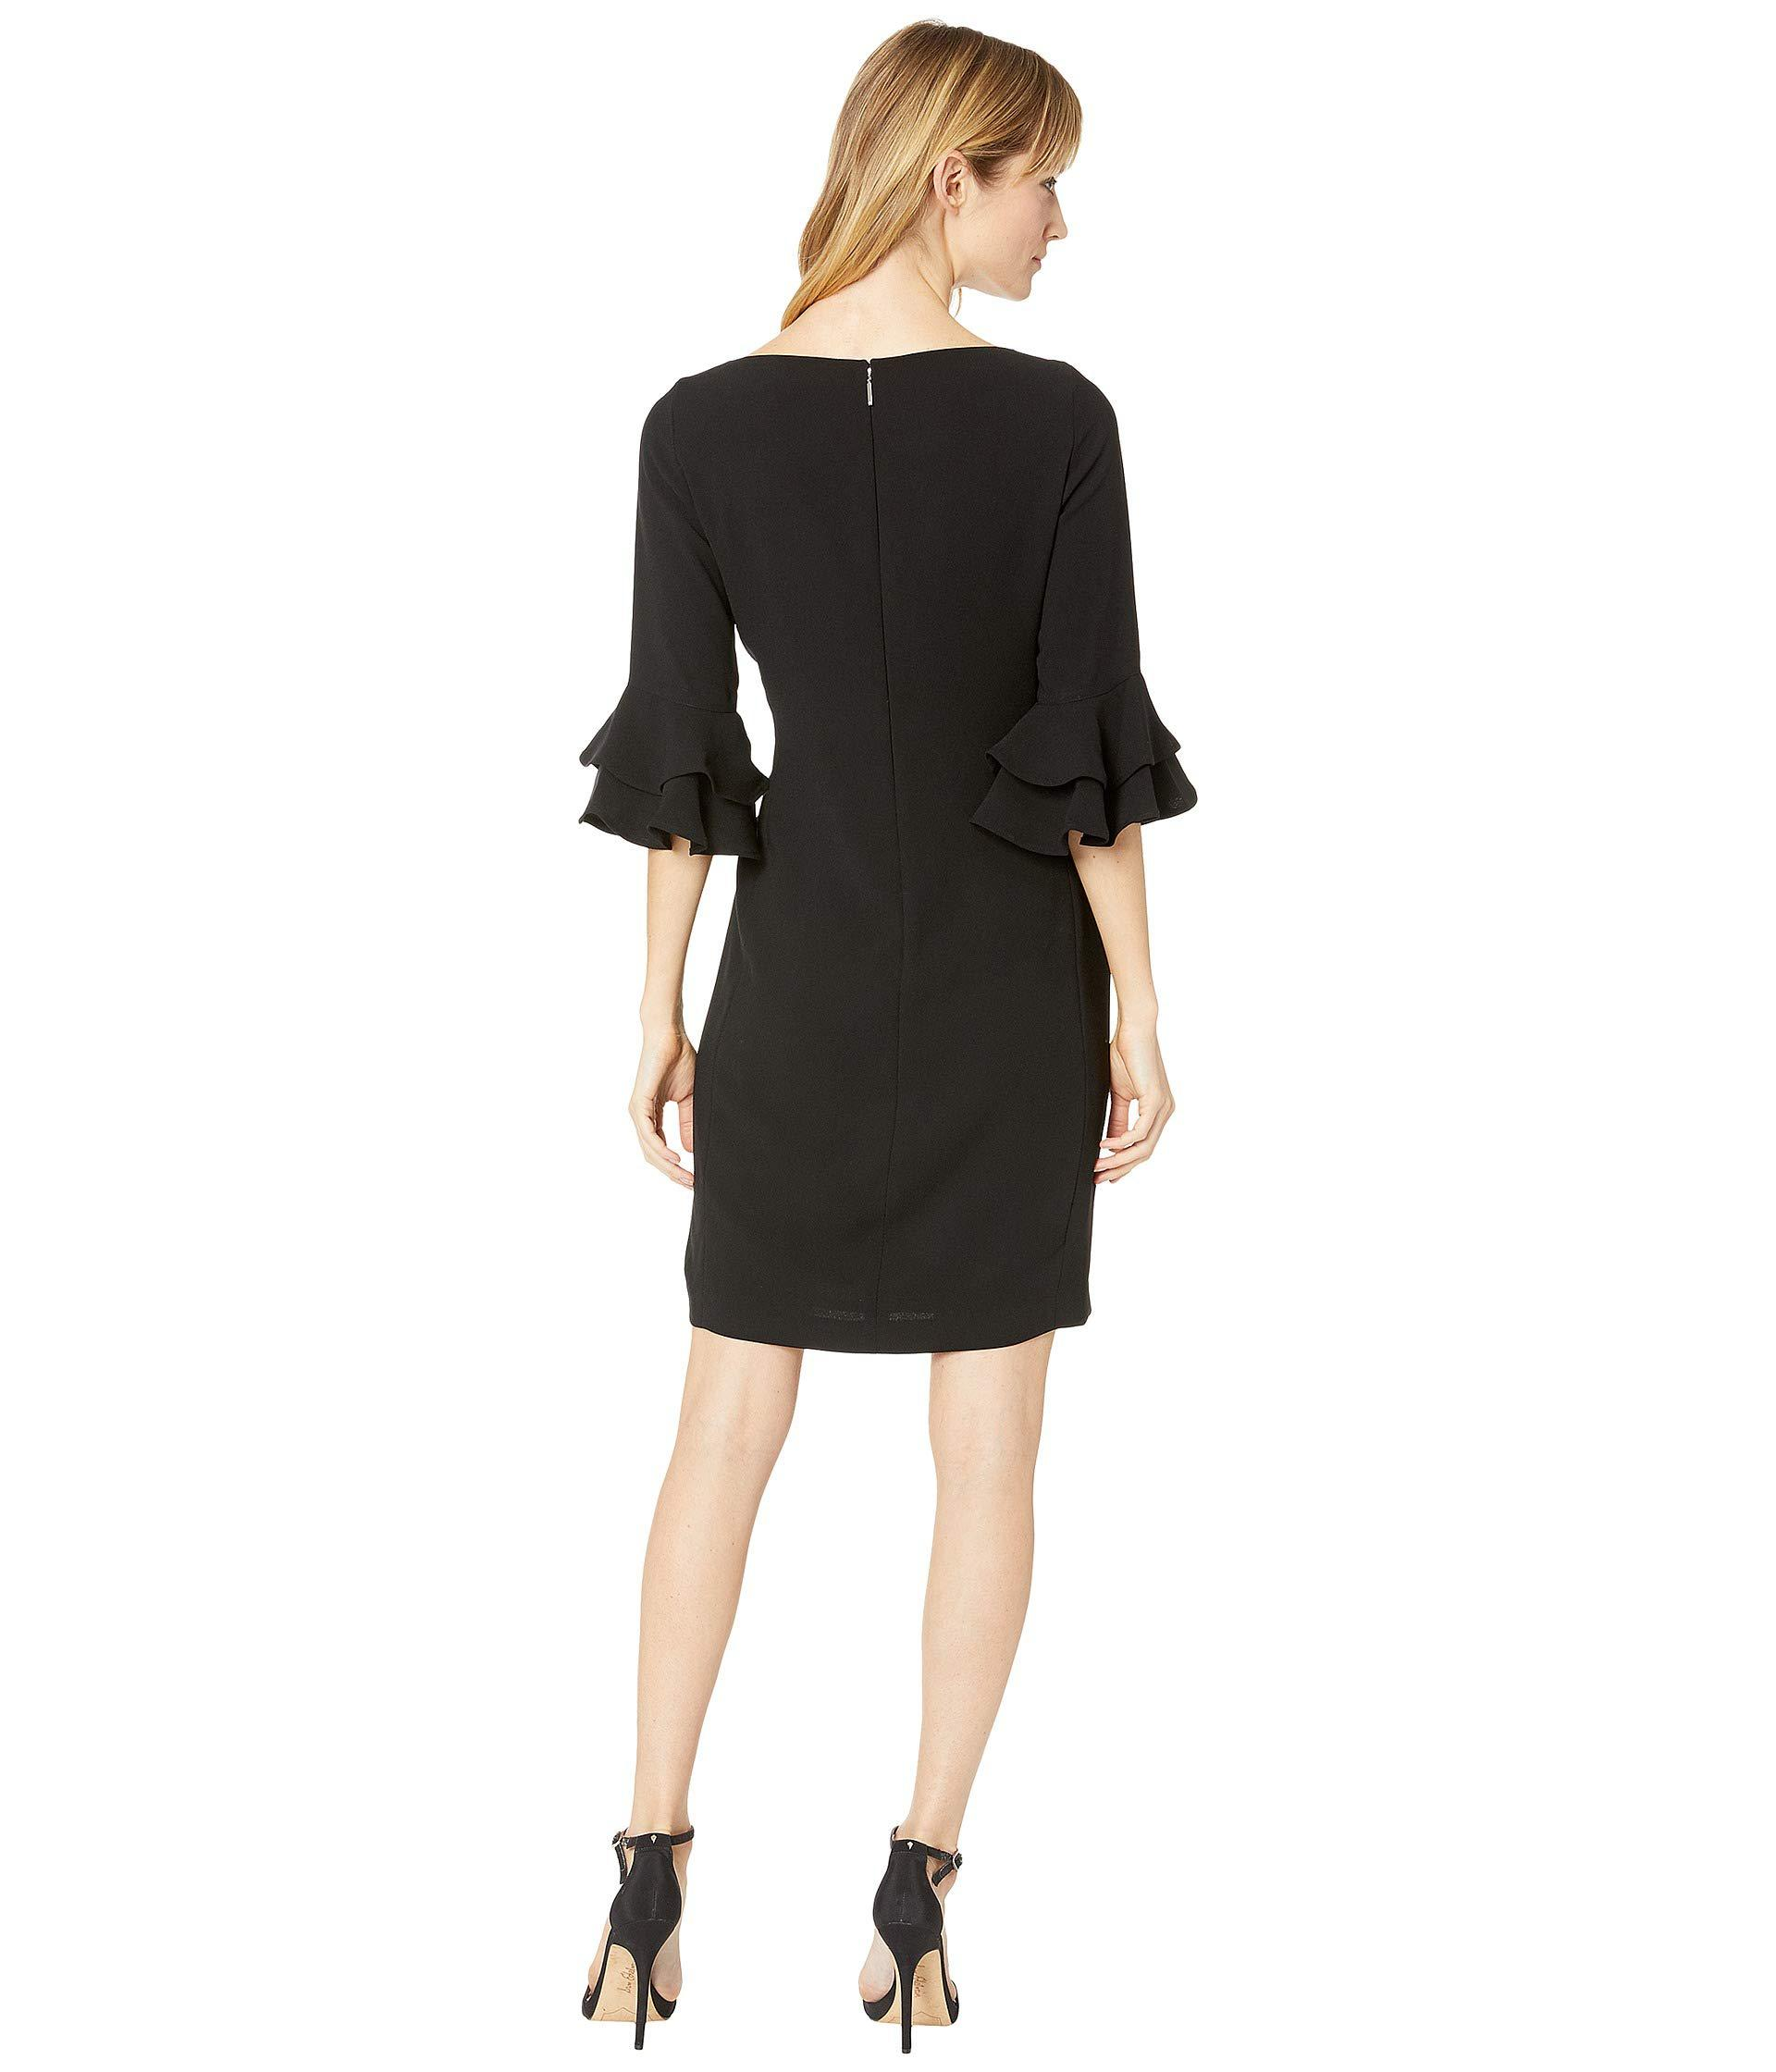 797e1a9864 Lauren by Ralph Lauren Ruffle-sleeve Crepe Dress (polo Black ...